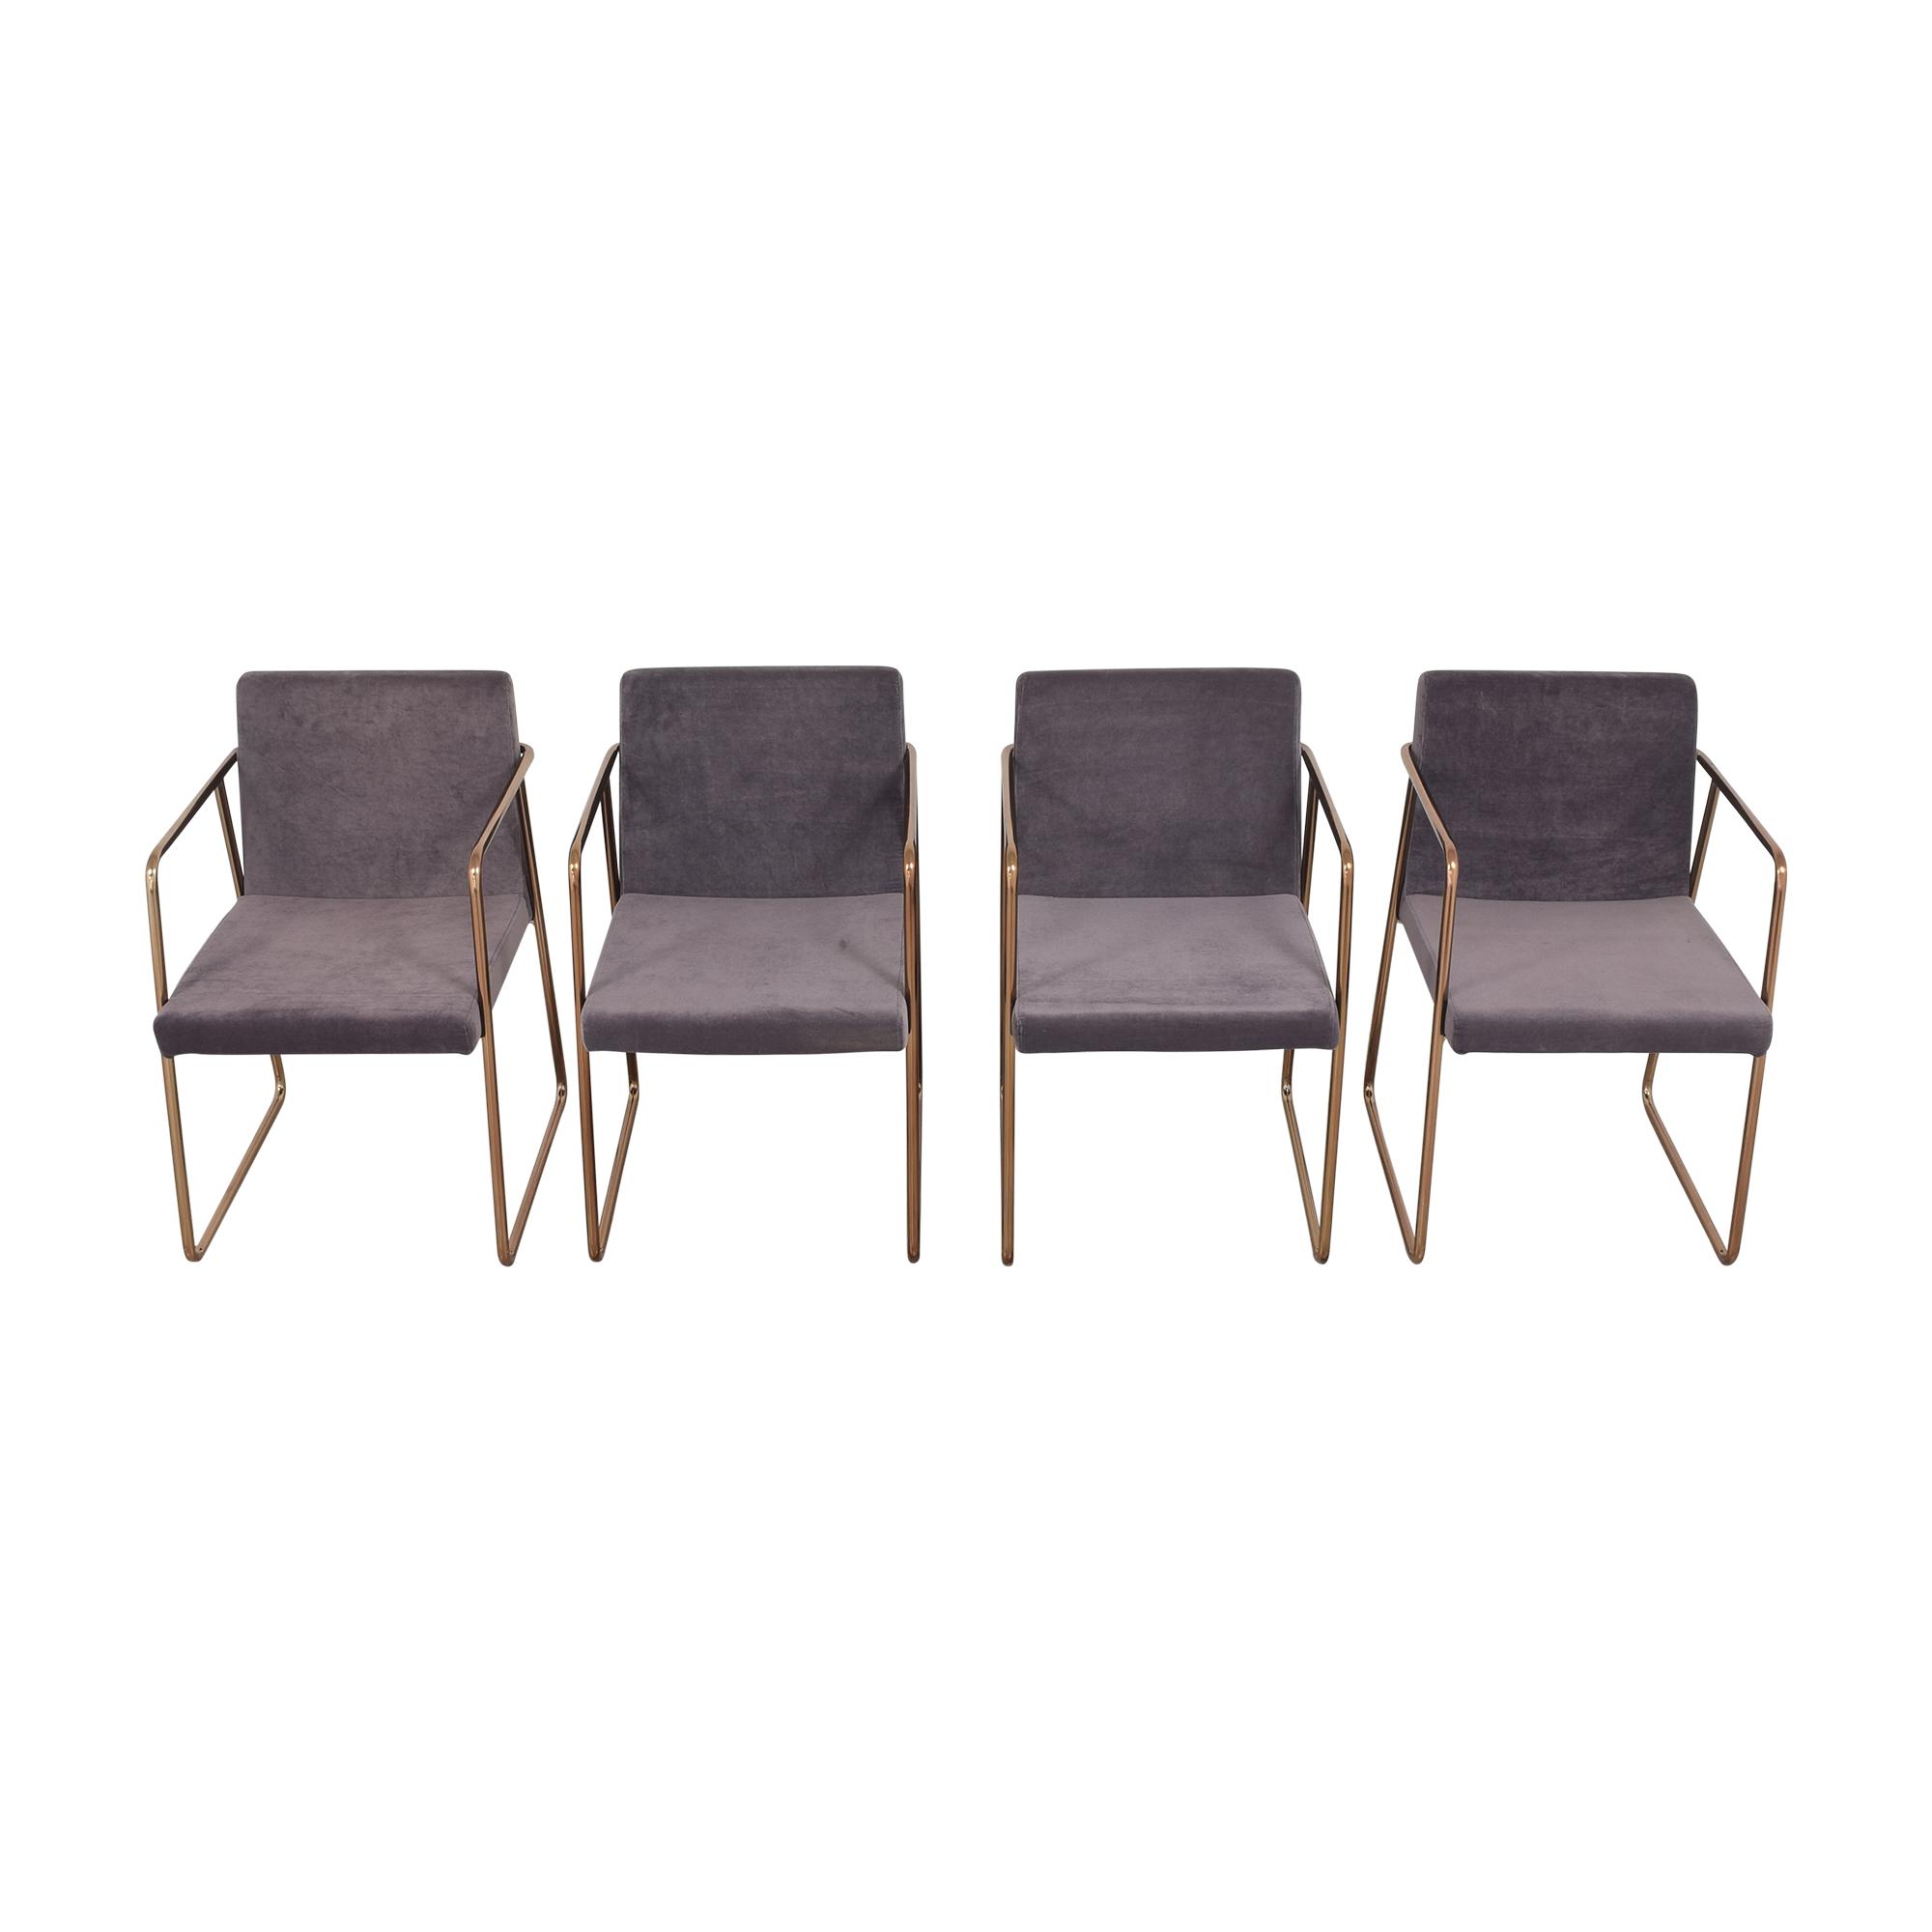 CB2 CB2 Rouka Chairs nj